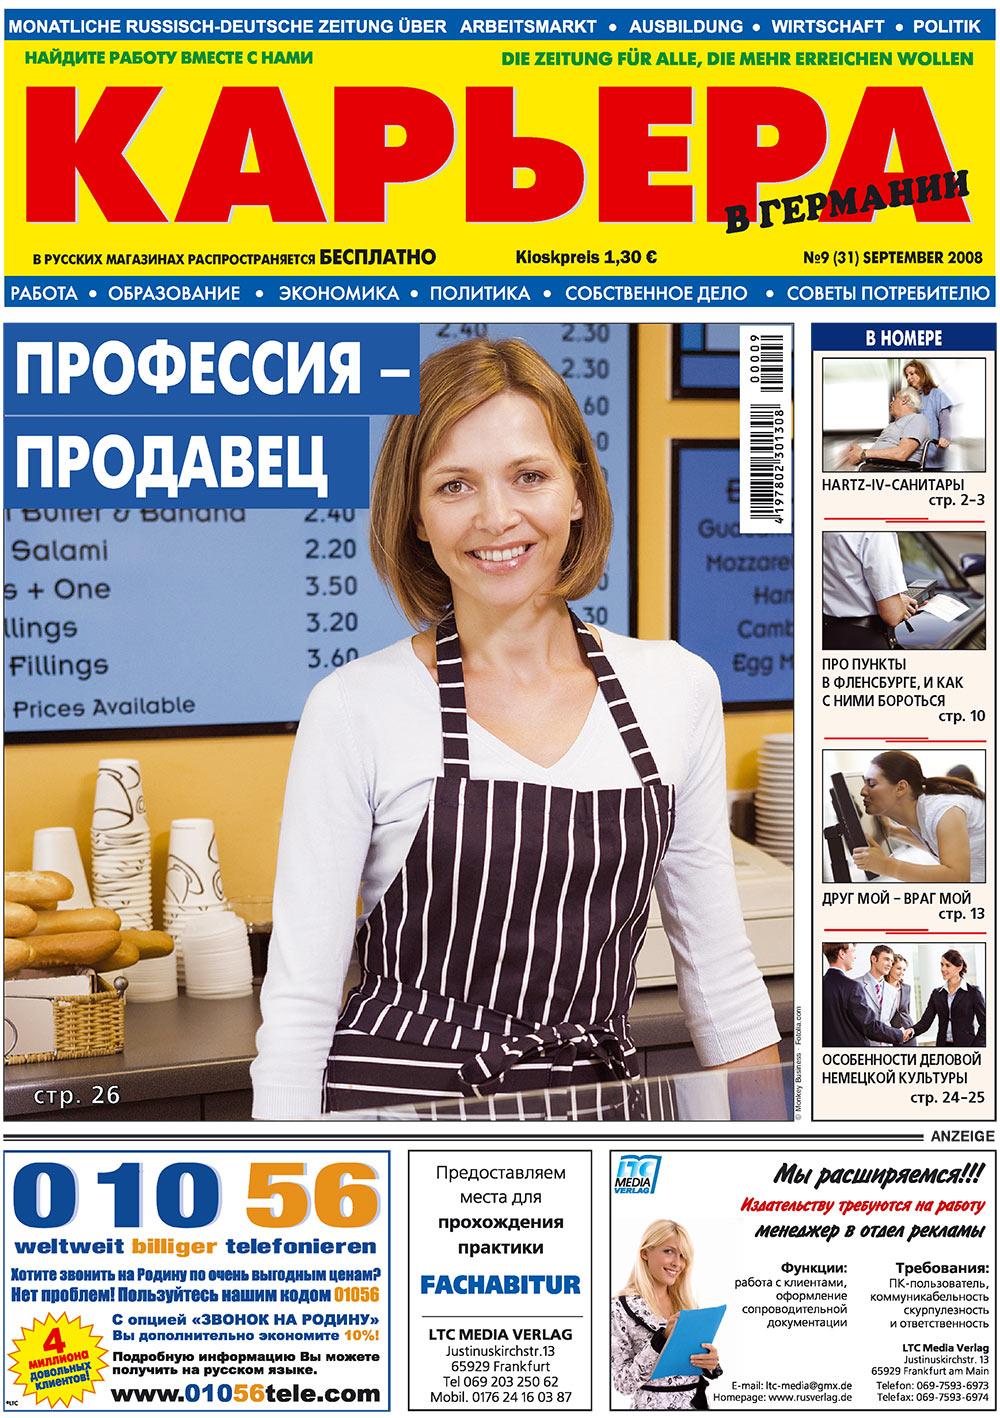 Карьера (газета). 2008 год, номер 9, стр. 1